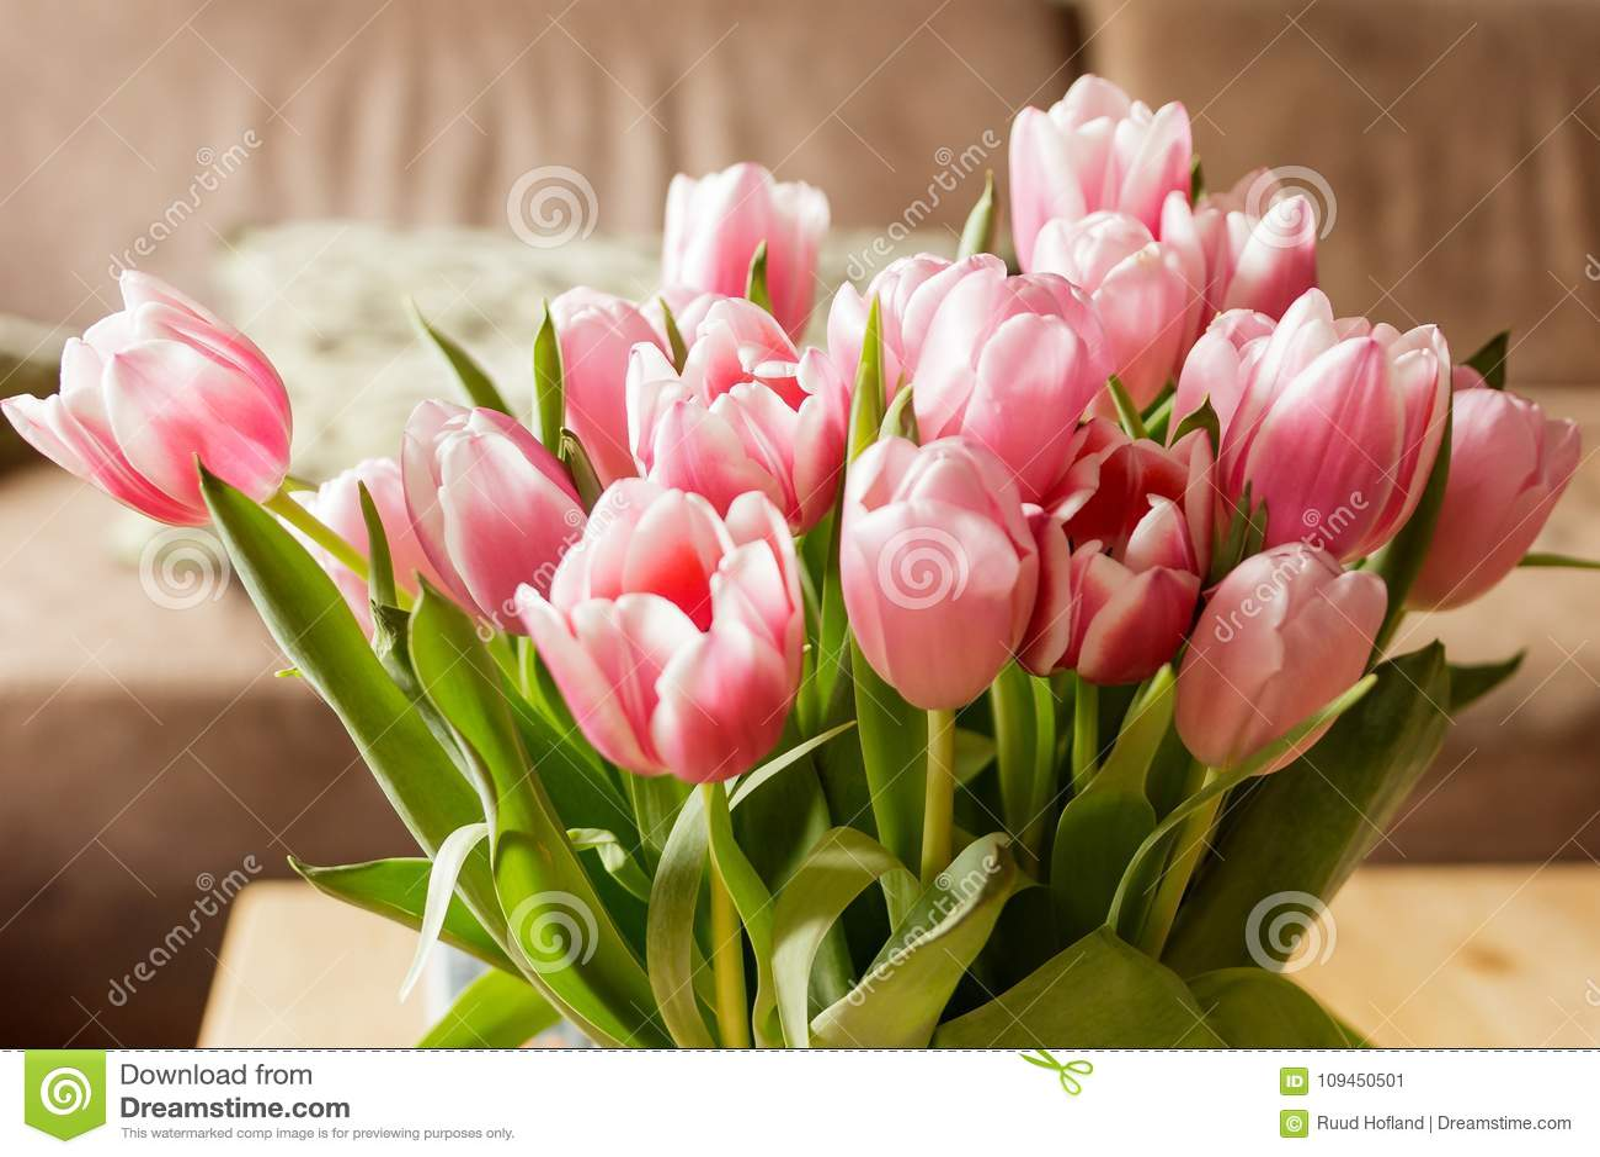 Тюльпаны от Голландии - тюльпаны валентинки